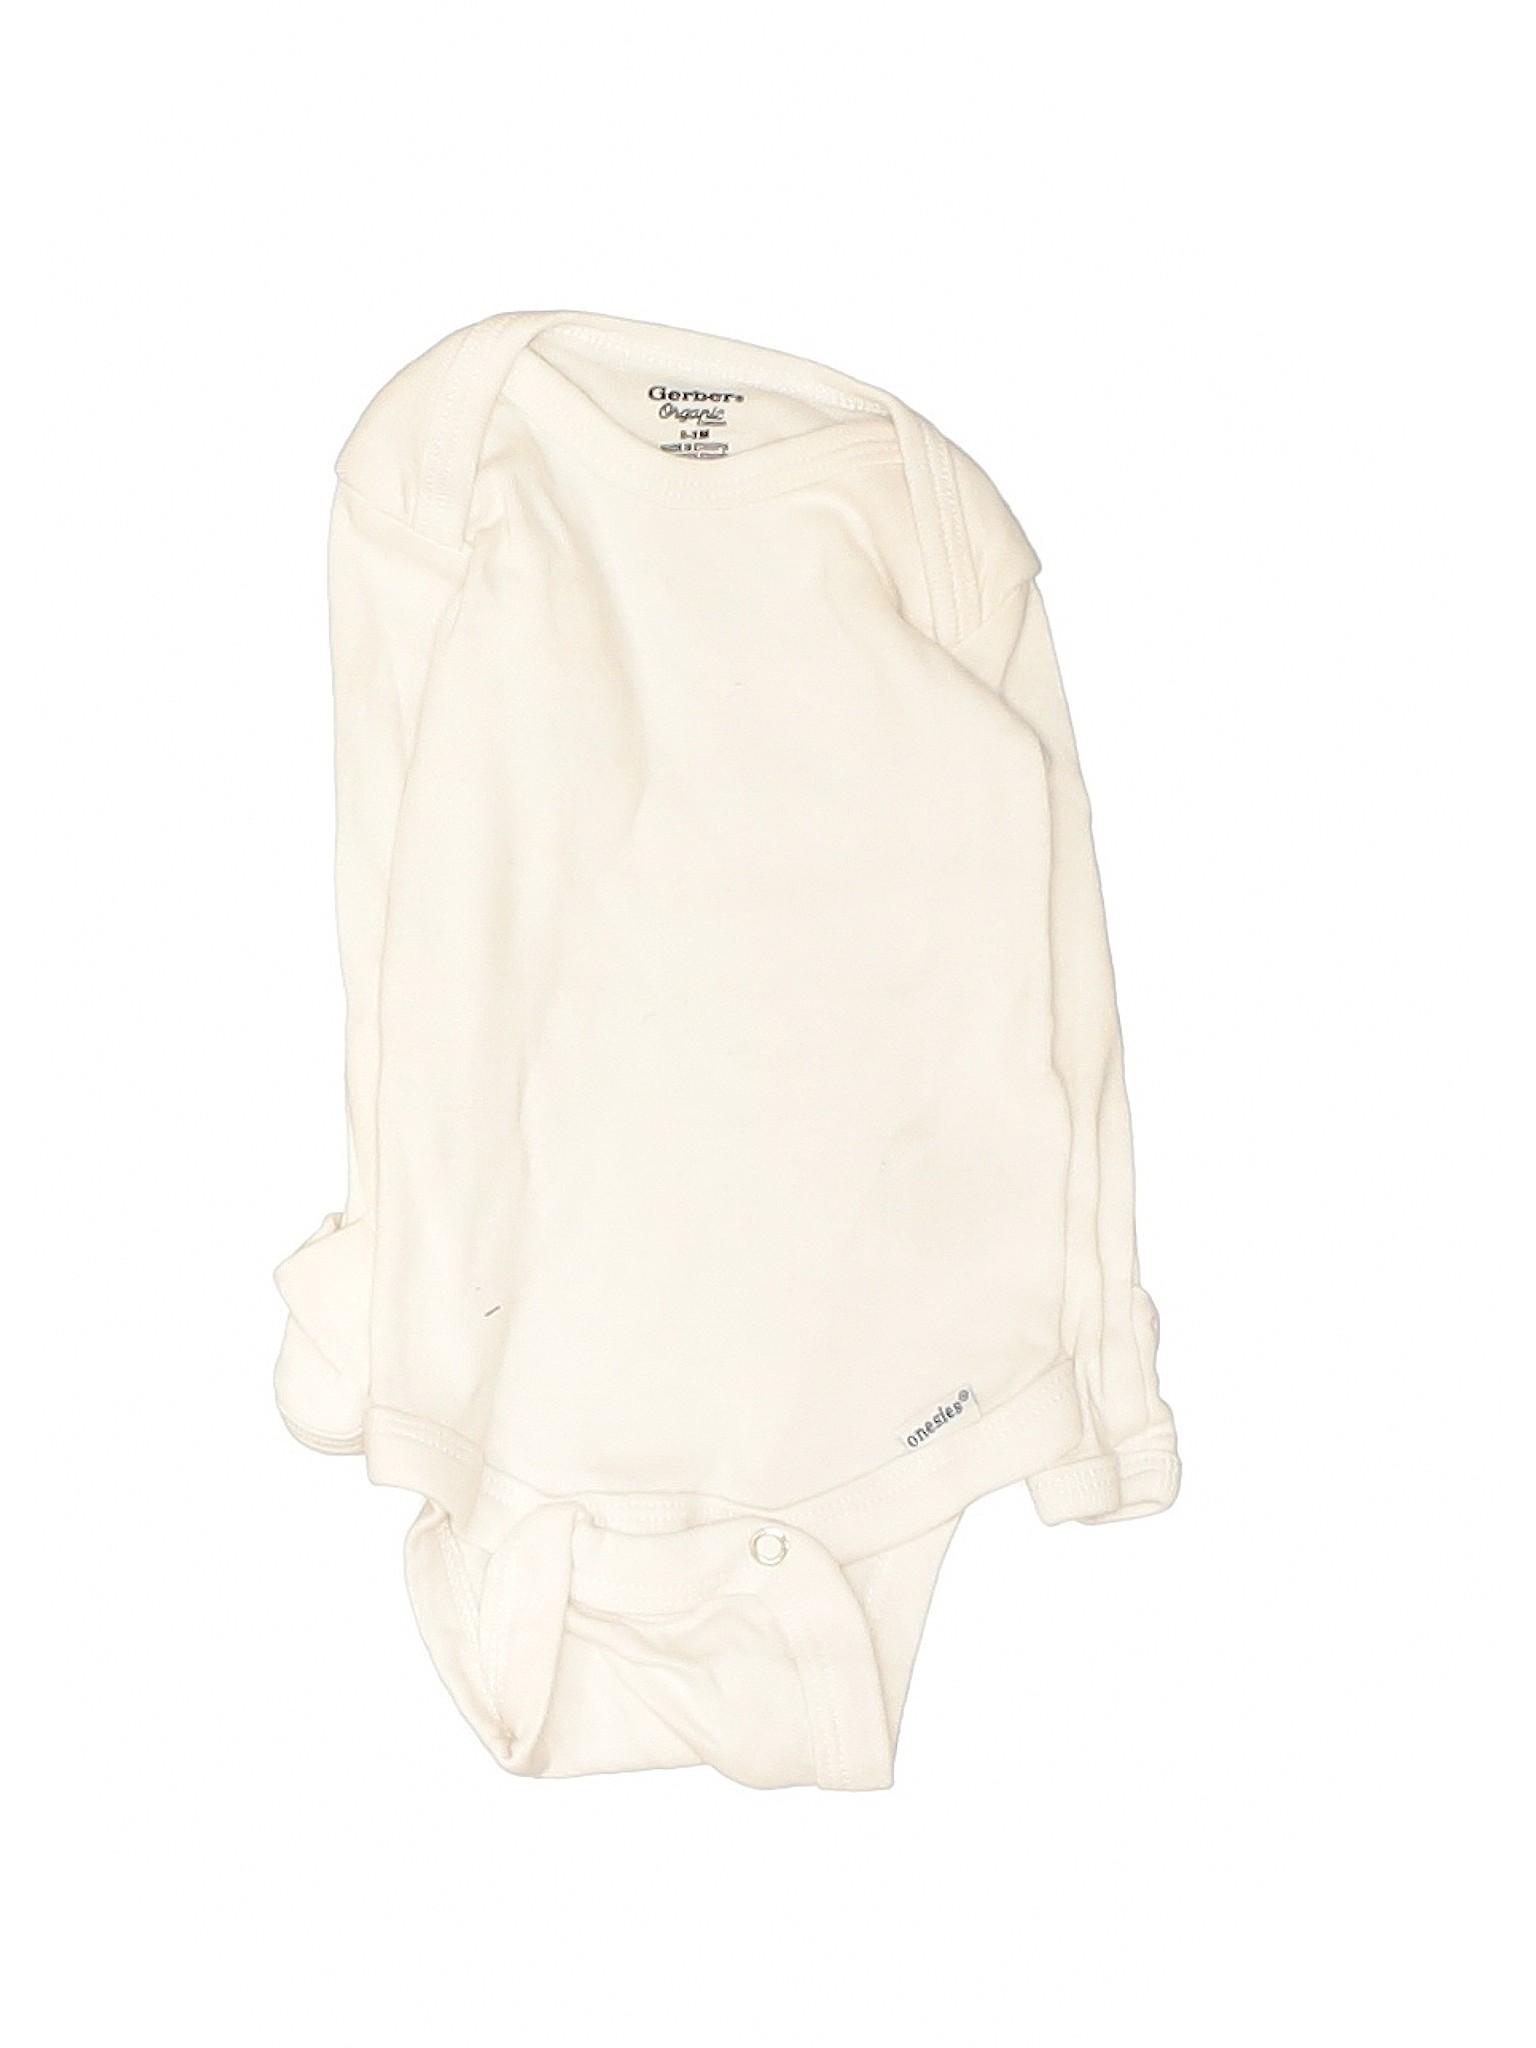 Gerber Organic Boys Ivory Long Sleeve Onesie 0-3 Months   eBay